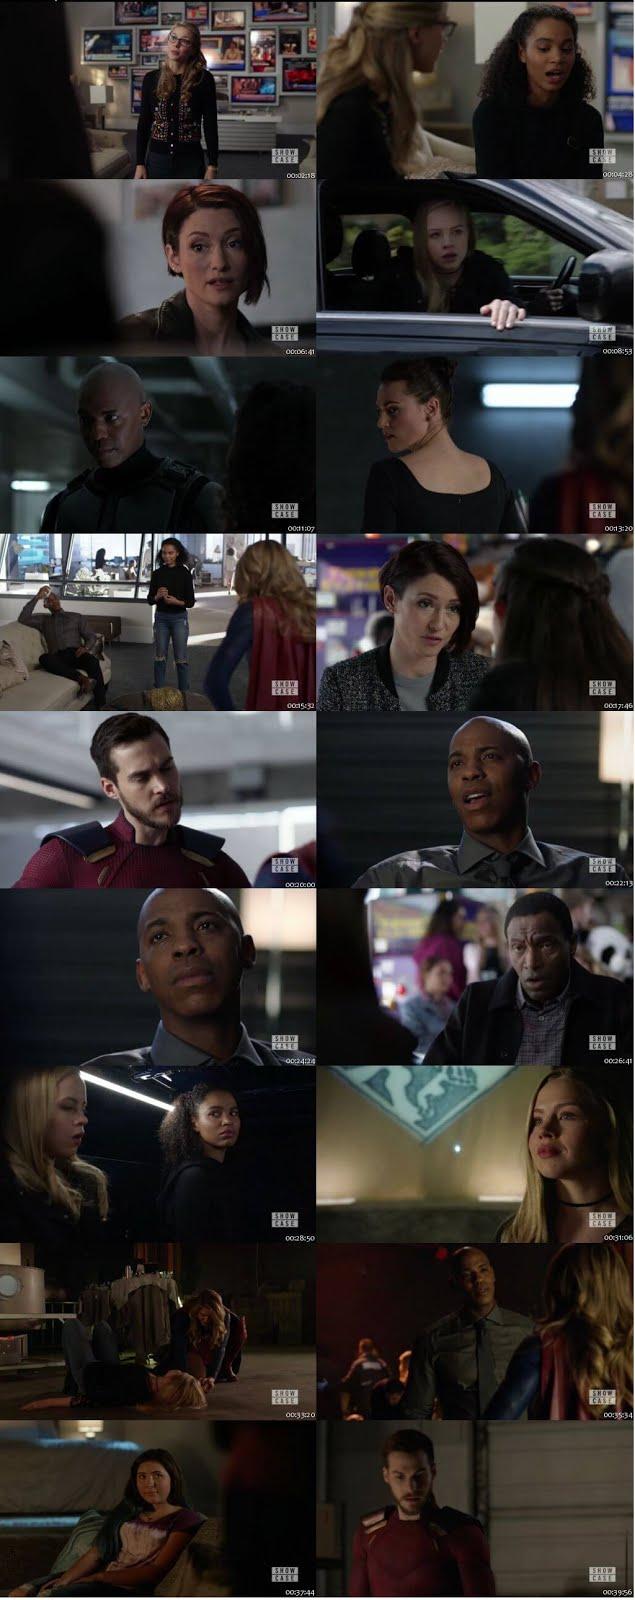 Supergirl S03E19 321MB HDTV 720p x264 1